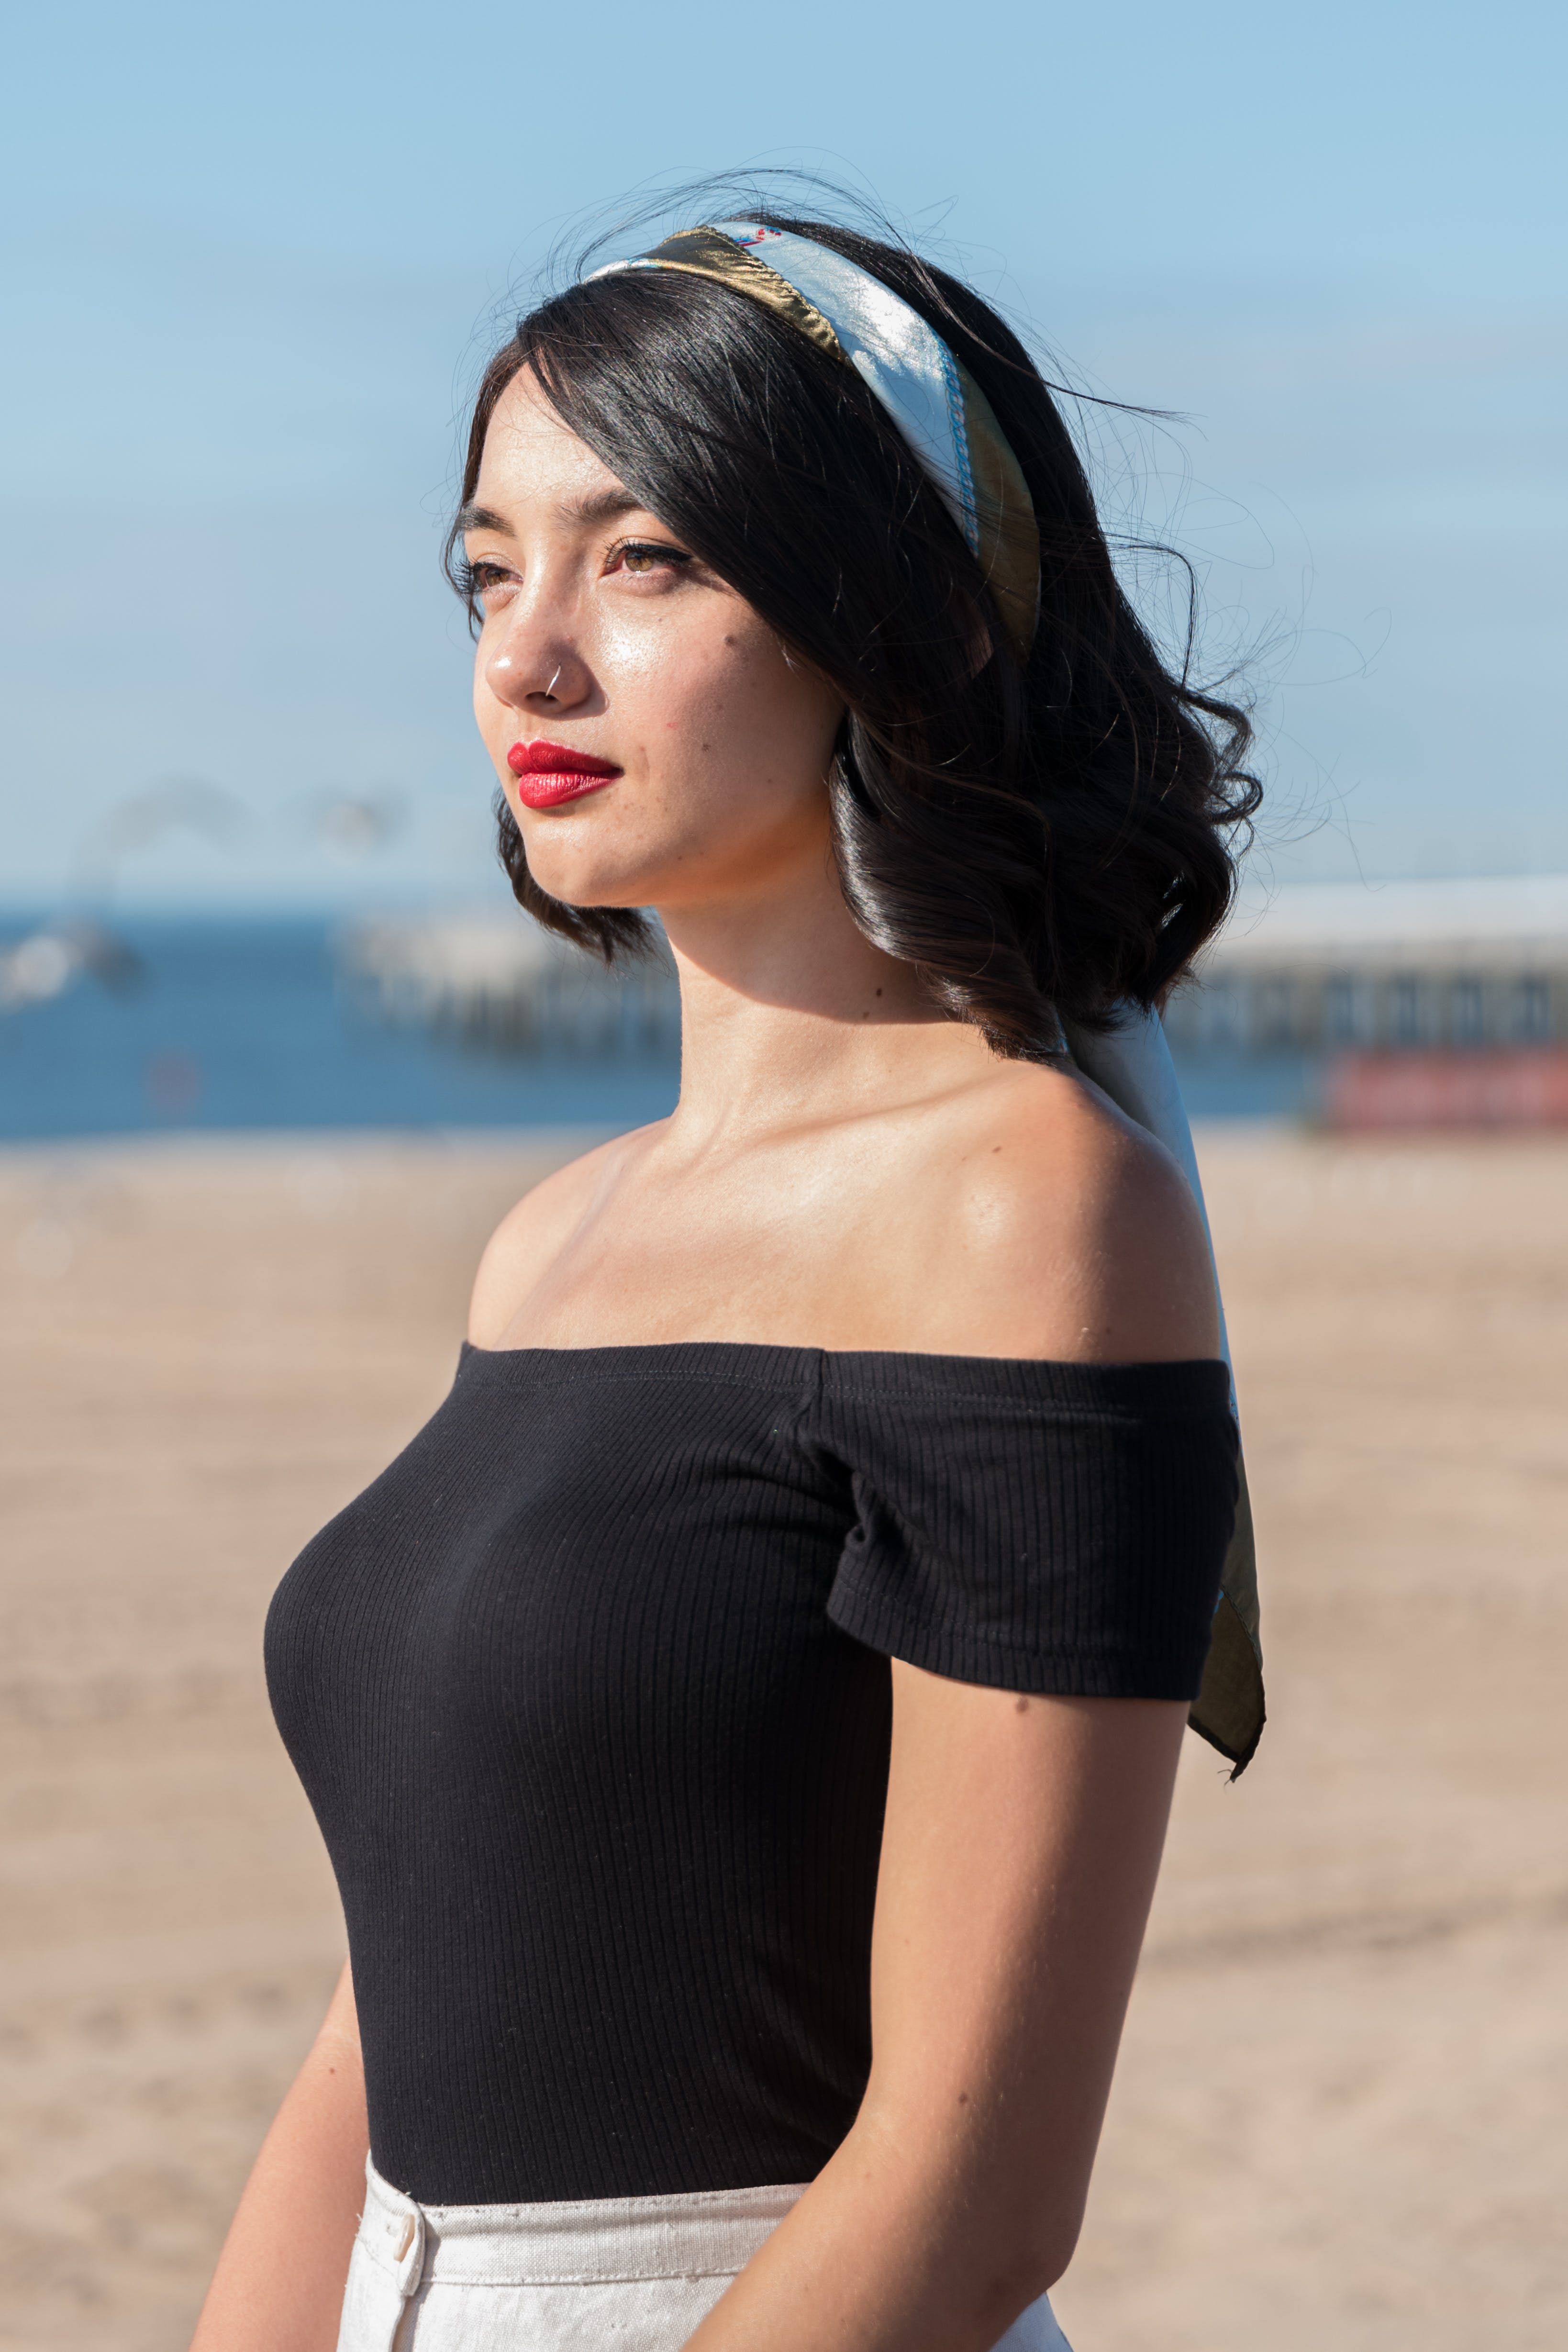 Photo Of Woman Wearing Black Off Shoulders